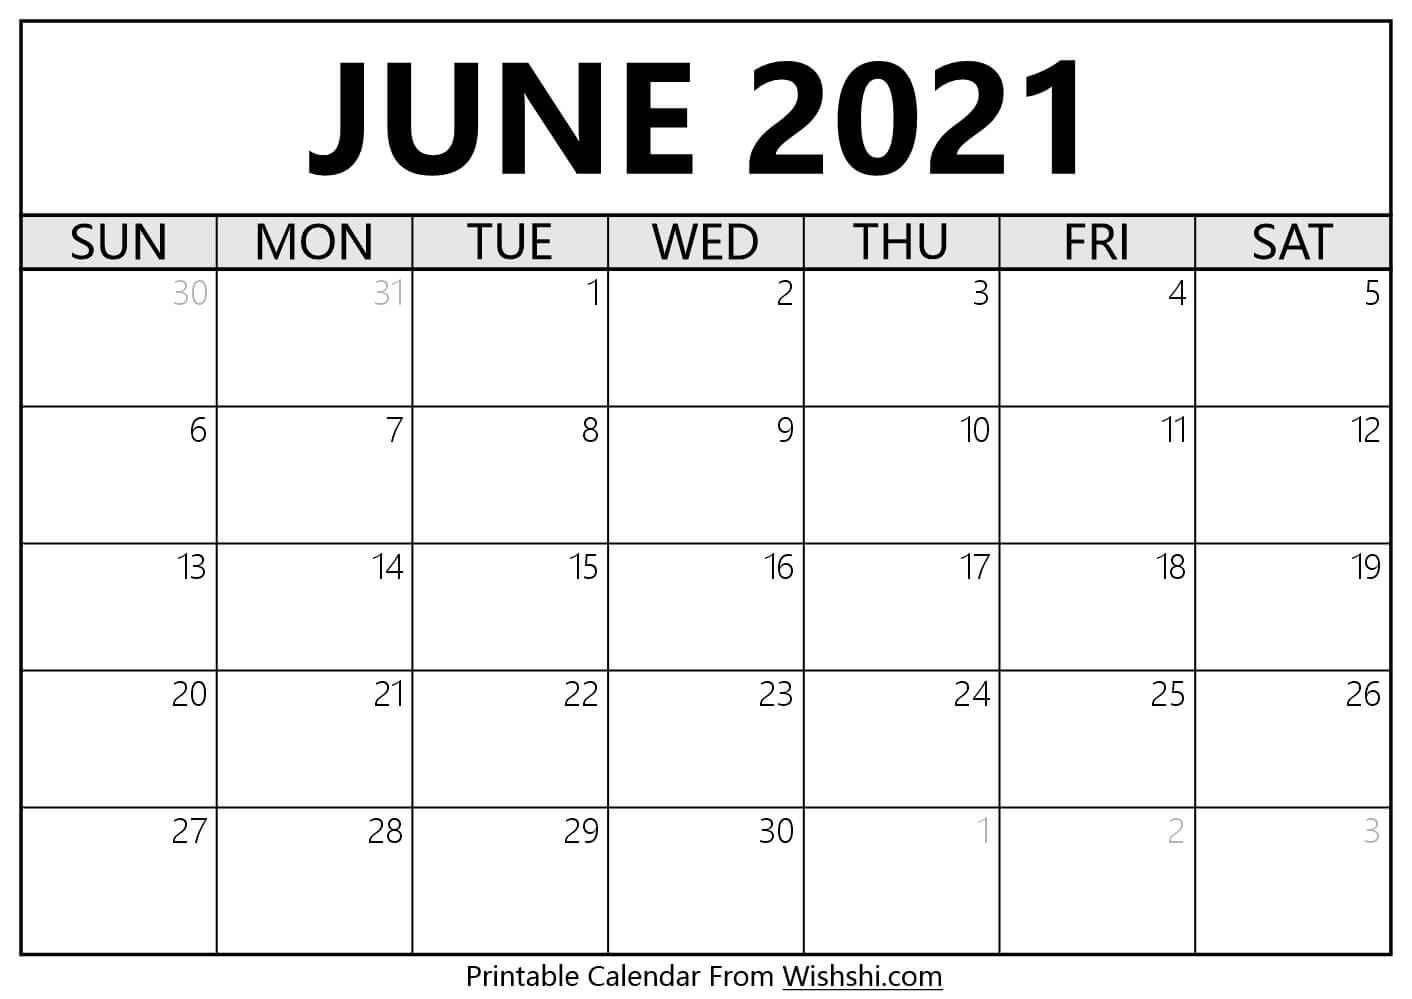 June 2021 Calendar Printable - Free Printable Calendars